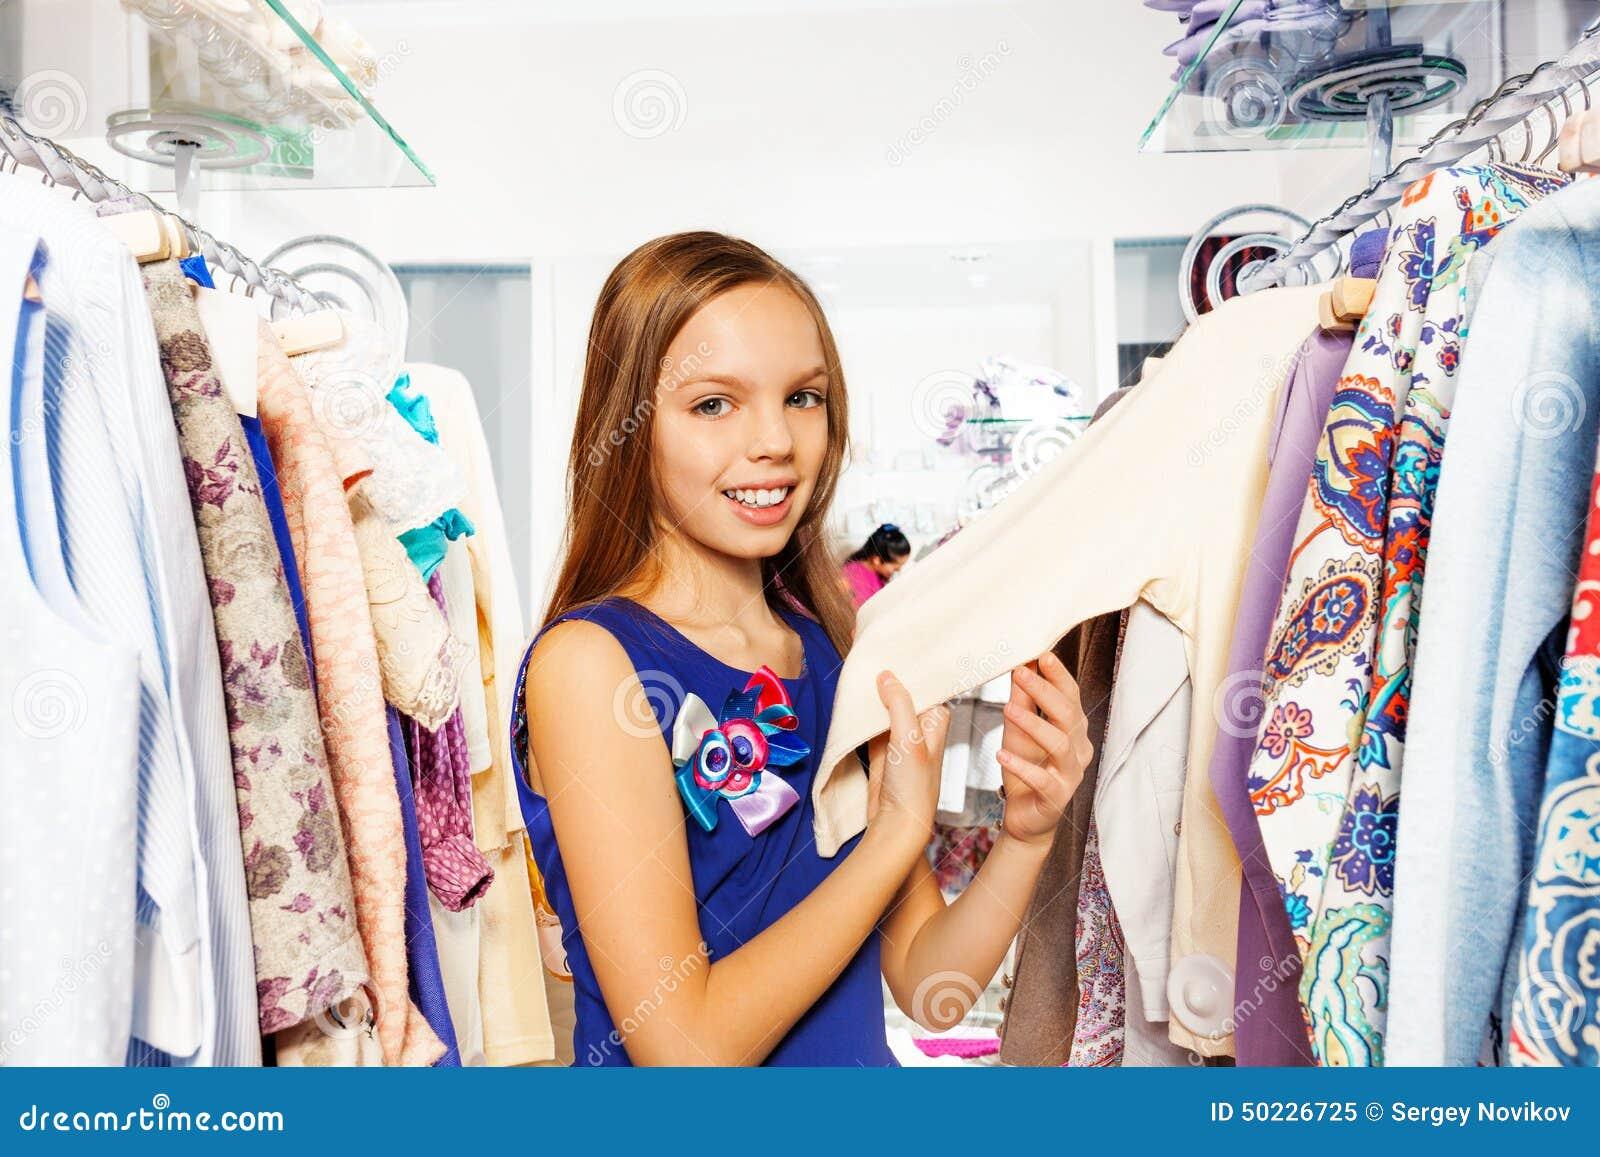 48002dbbc Menina feliz entre a roupa nos ganchos e a pesquisa pela roupa na loja